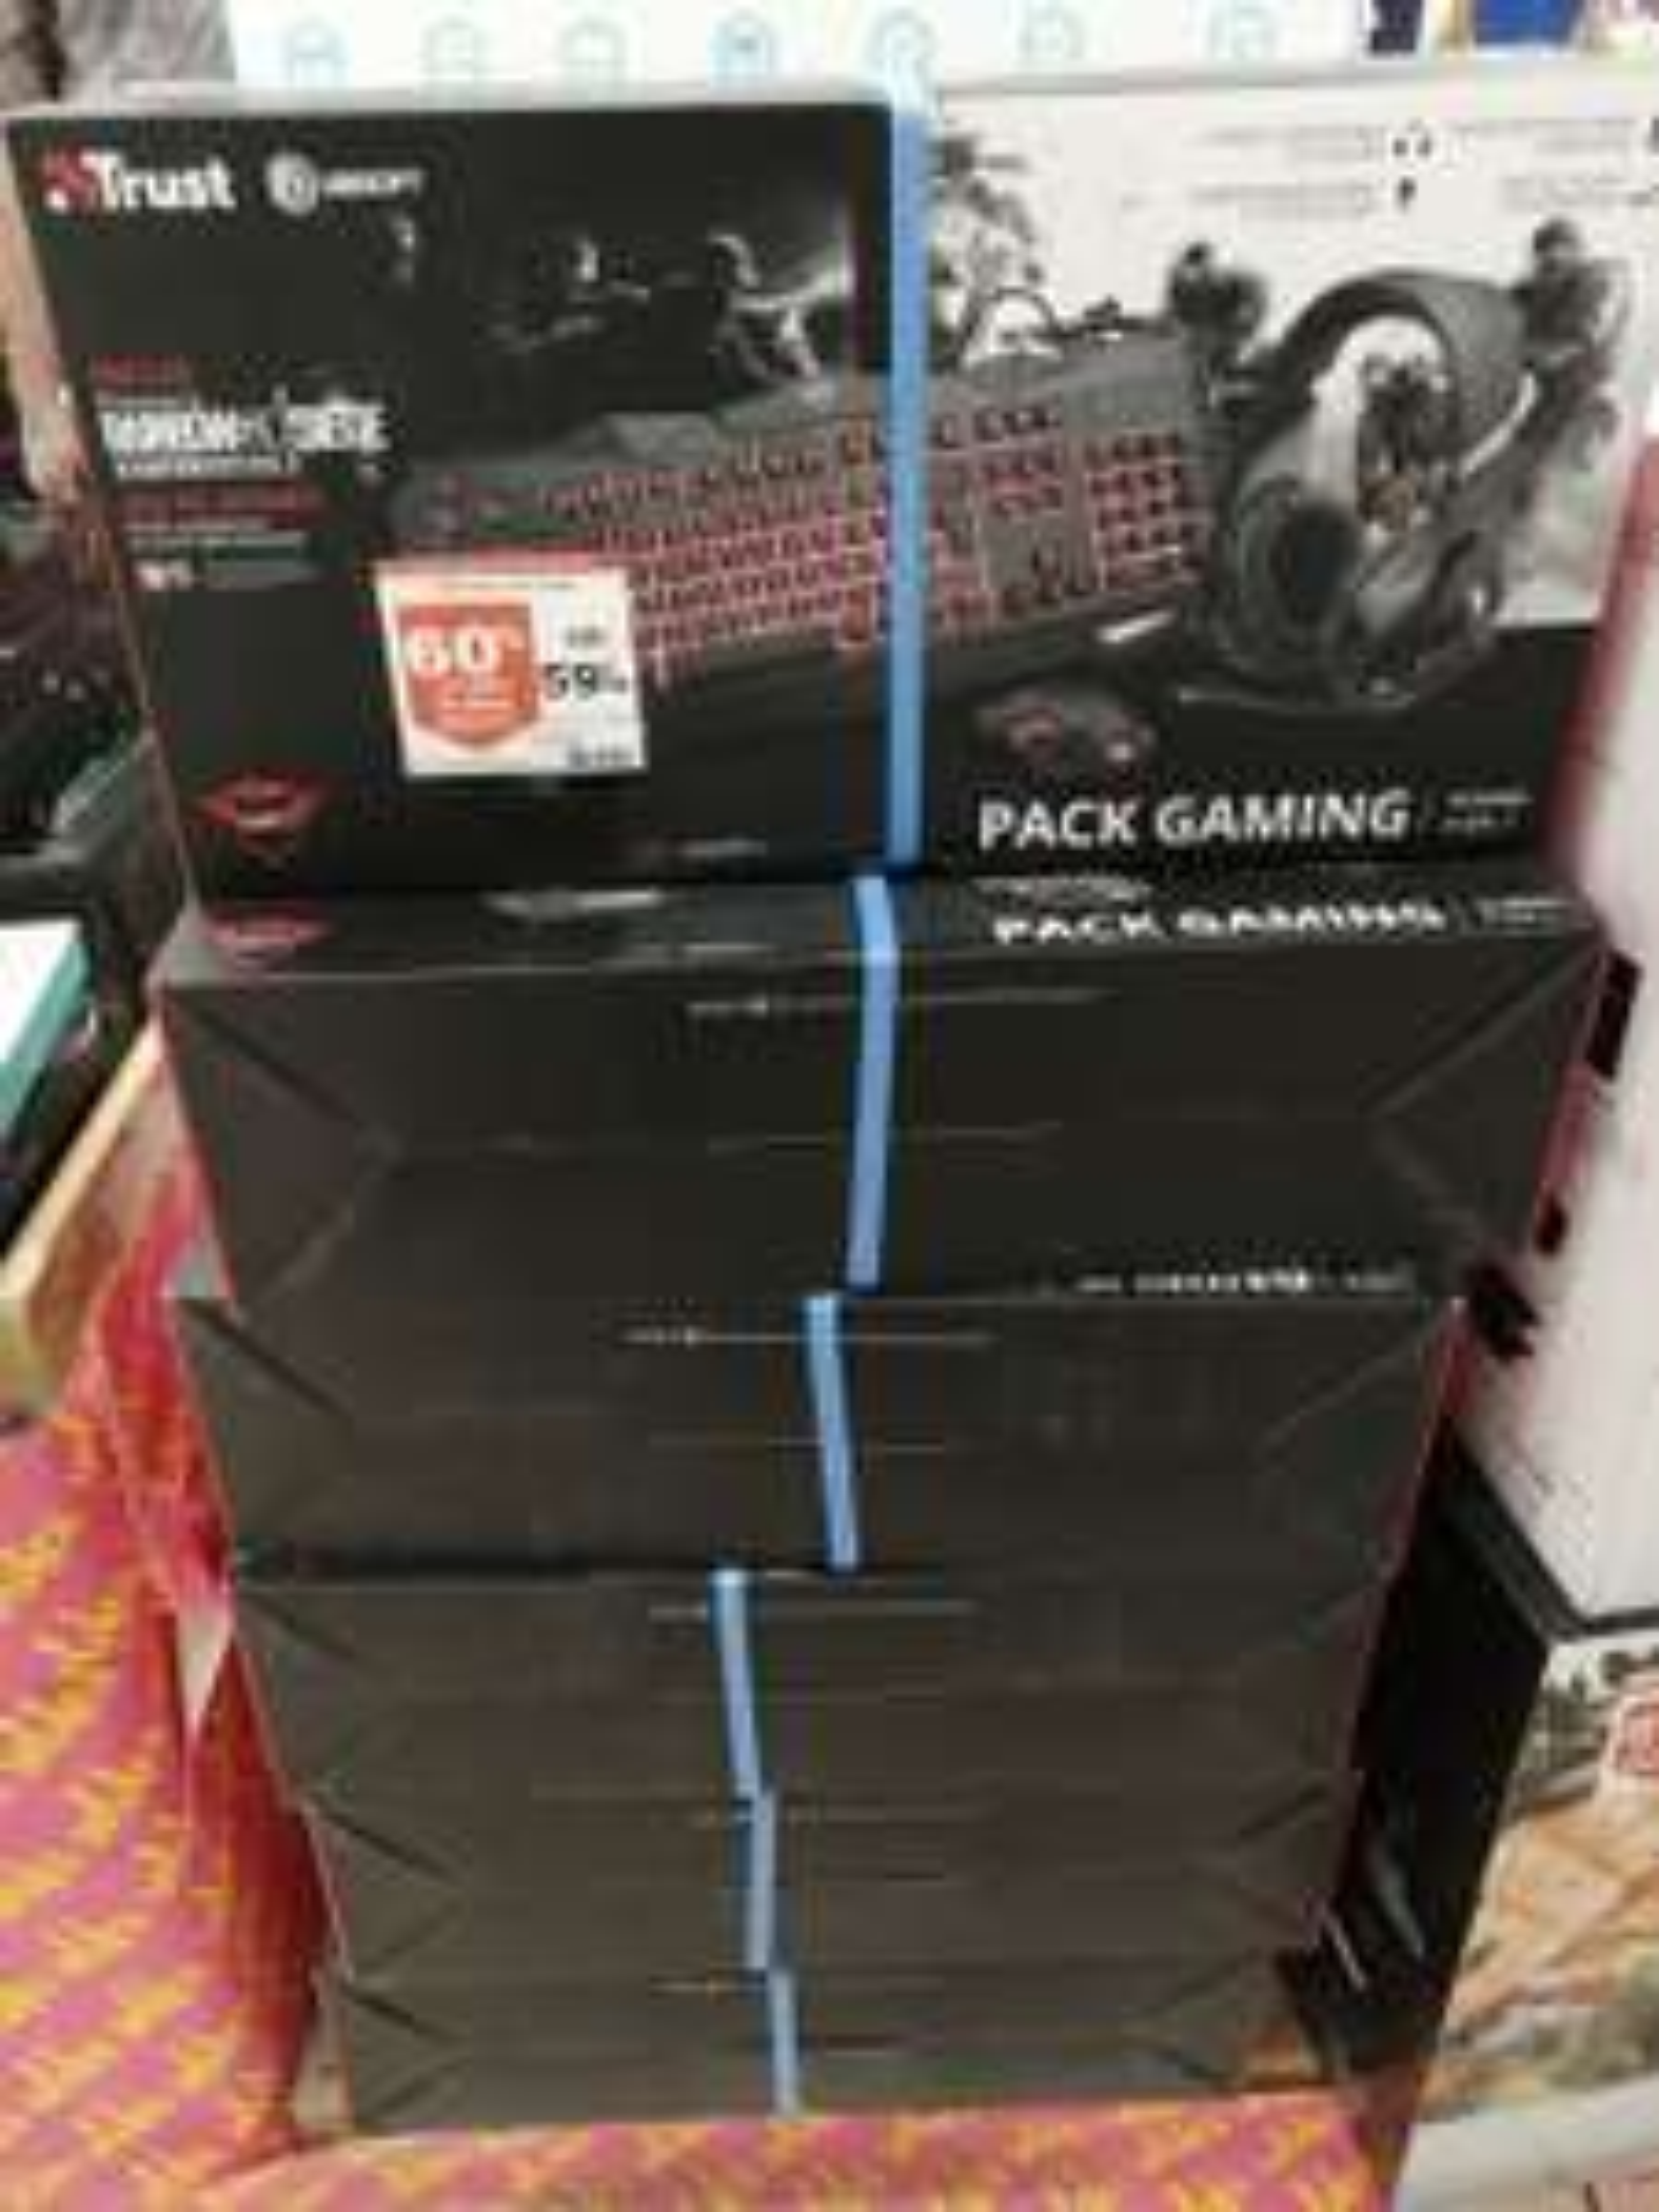 Bundle Gaming 4-en-1 Trust GXT840 - Villebon (91)